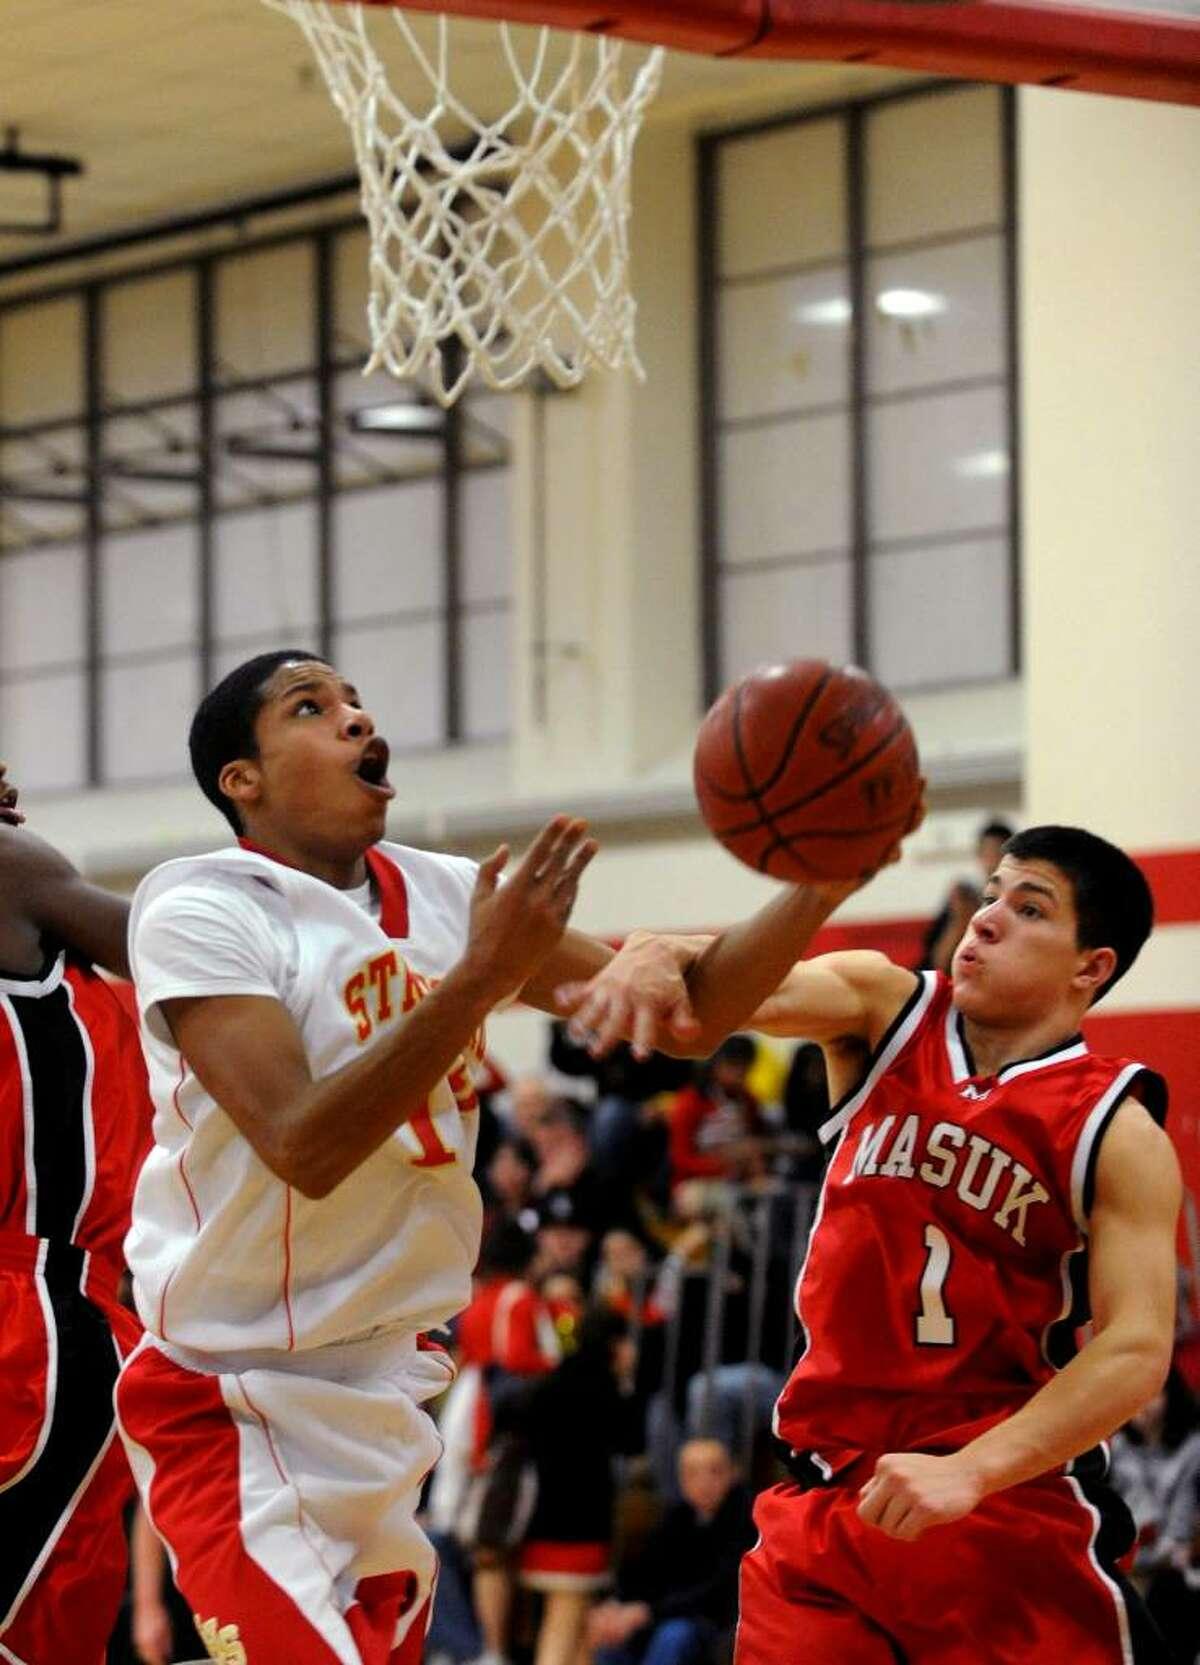 Masuk's #1 Anthony Delorenzo, right, blocks Stratford's #12 Russell Payton, during basketball action in Stratford, Conn. on Friday Jan. 15, 2010.